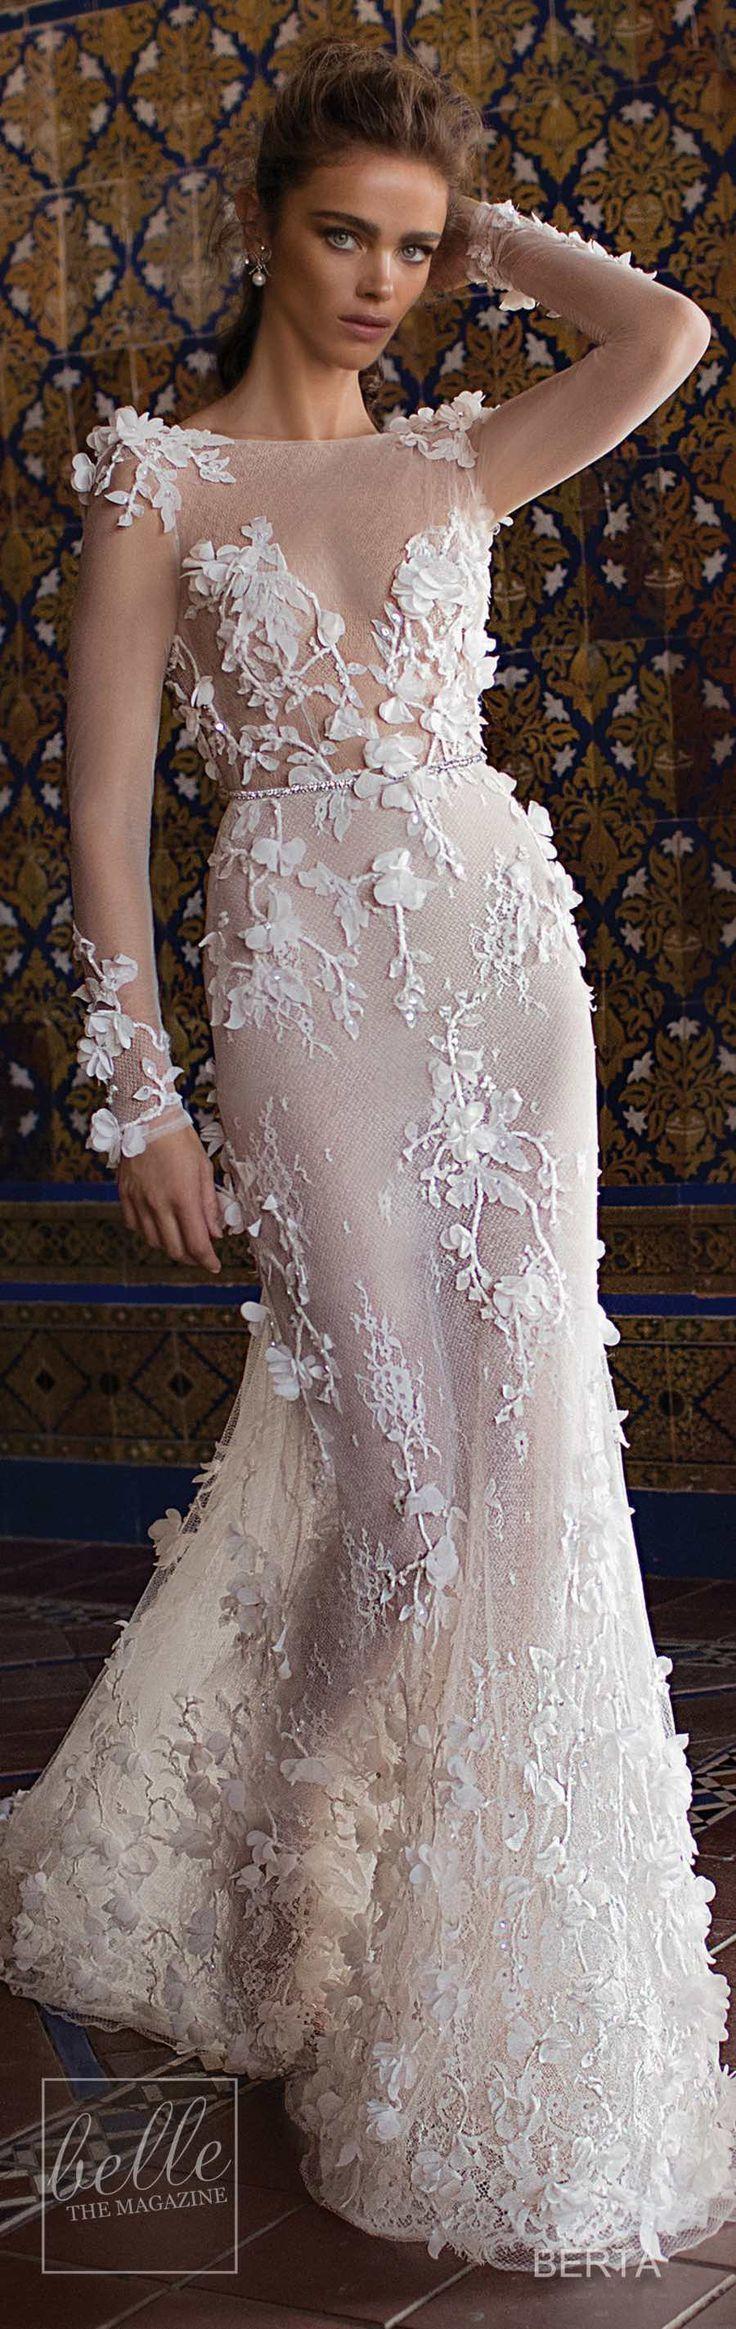 183 besten Long Sleeve Wedding Dresses Bilder auf Pinterest ...